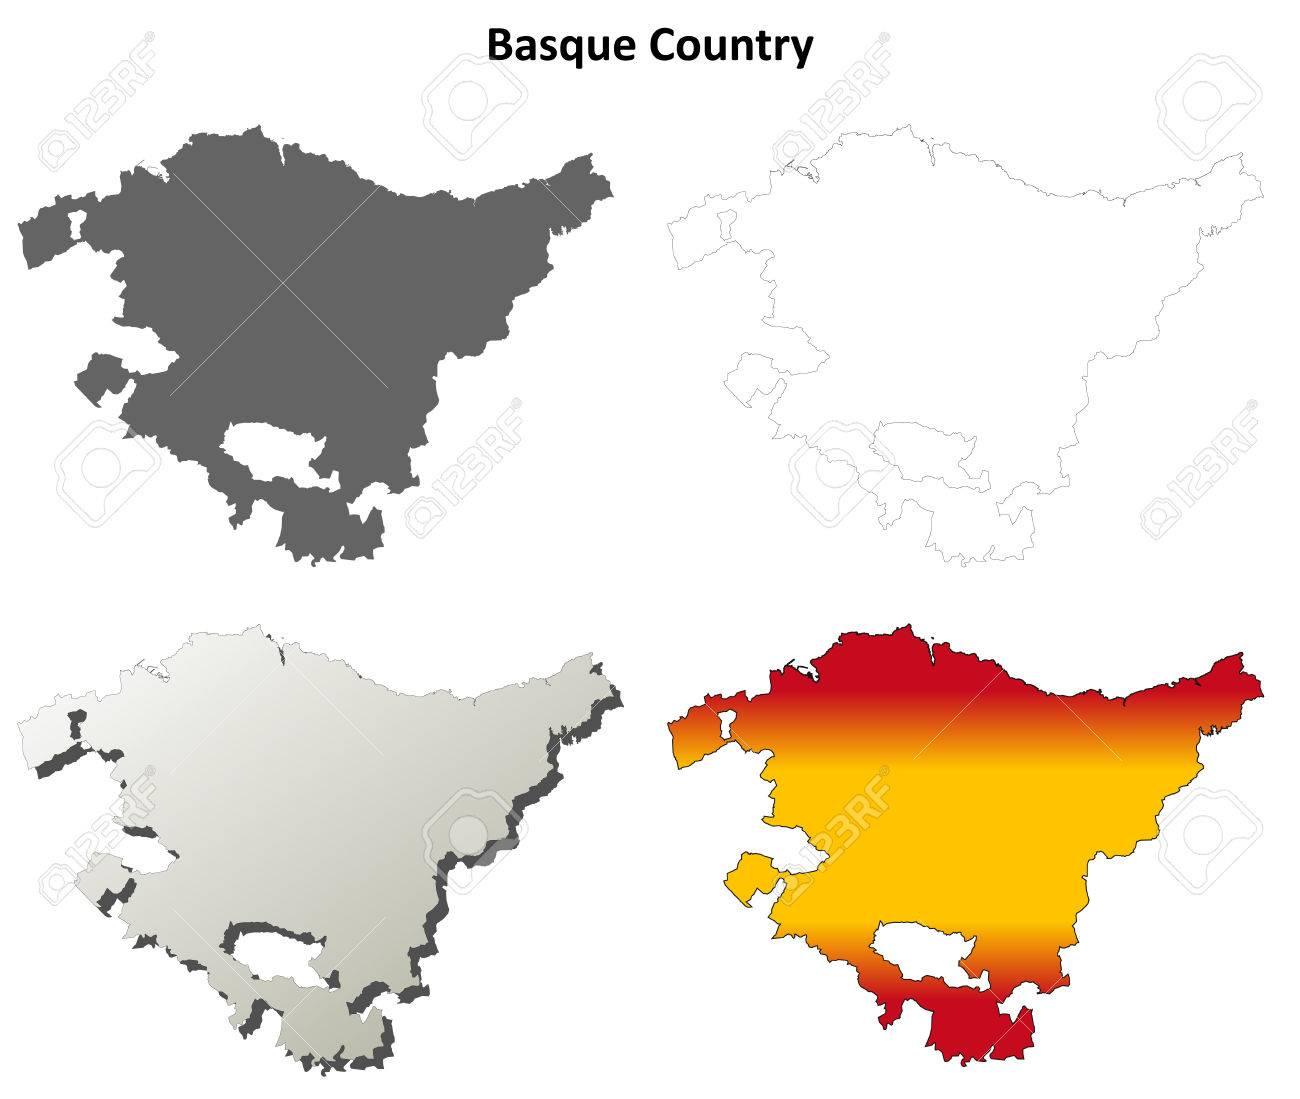 Carte Espagne Pays Basque Detaillee.Pays Basque Vierge Apercu Carte Detaillee Set Version Espagnole